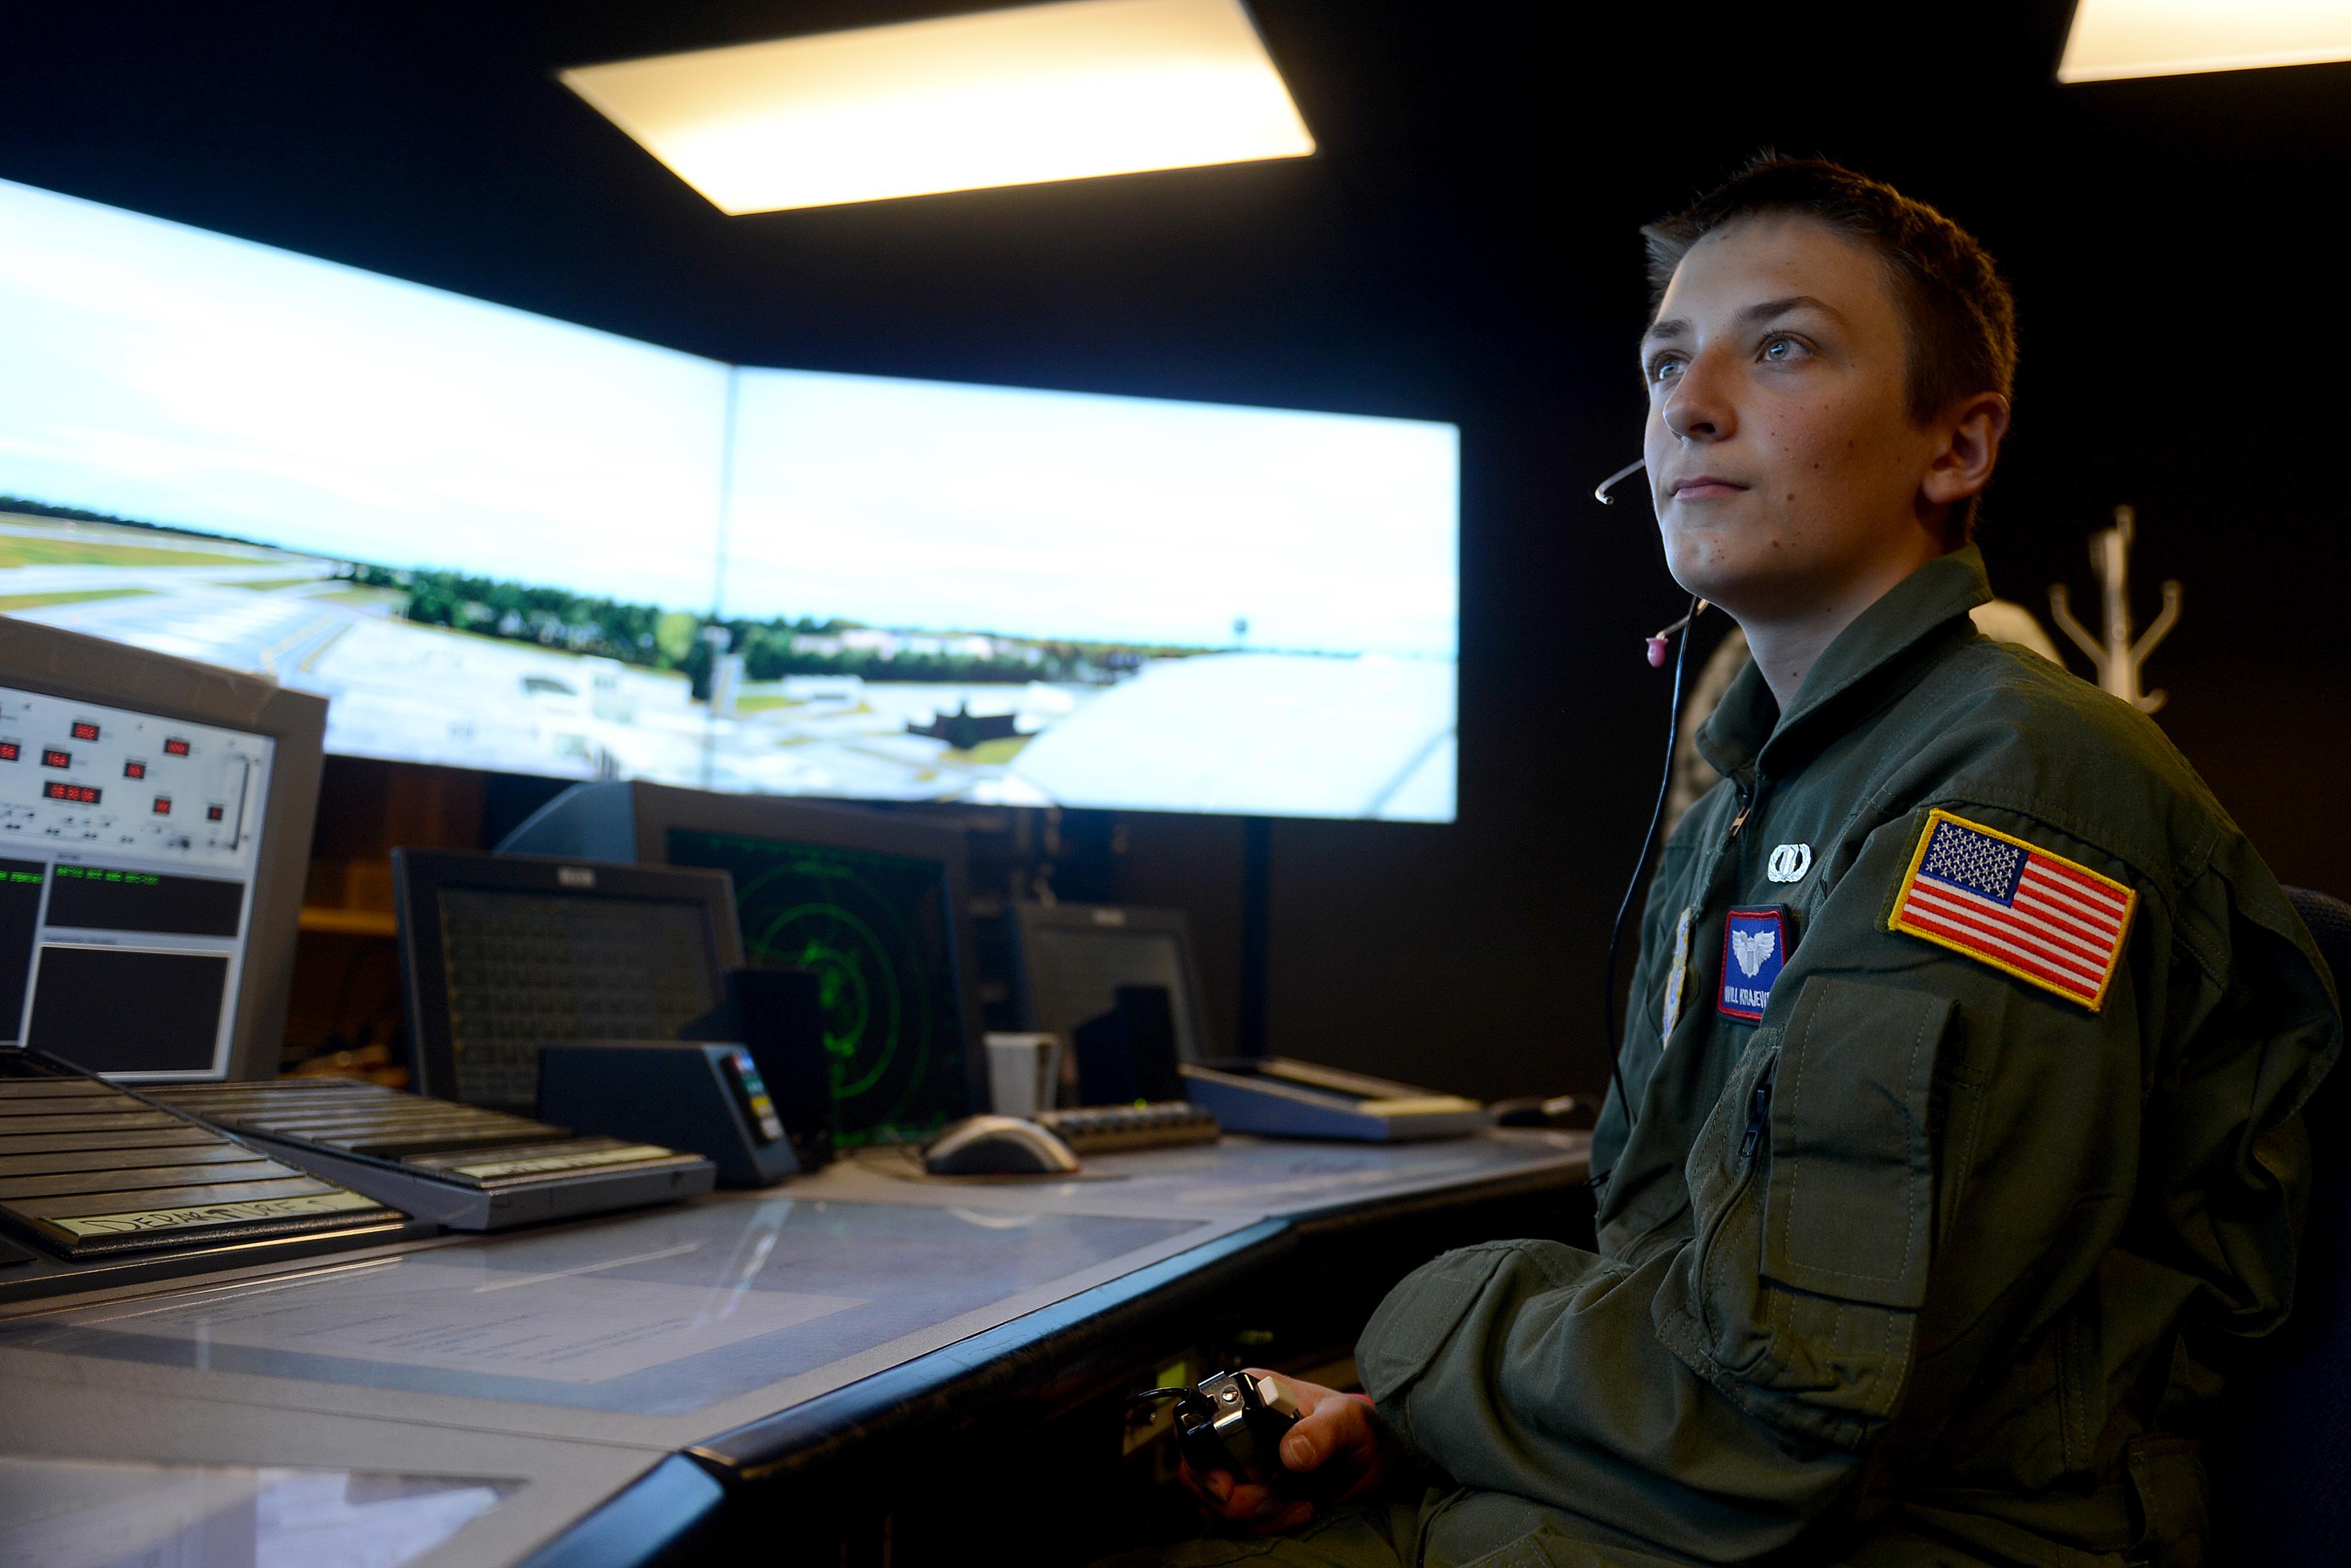 Air traffic control simulation